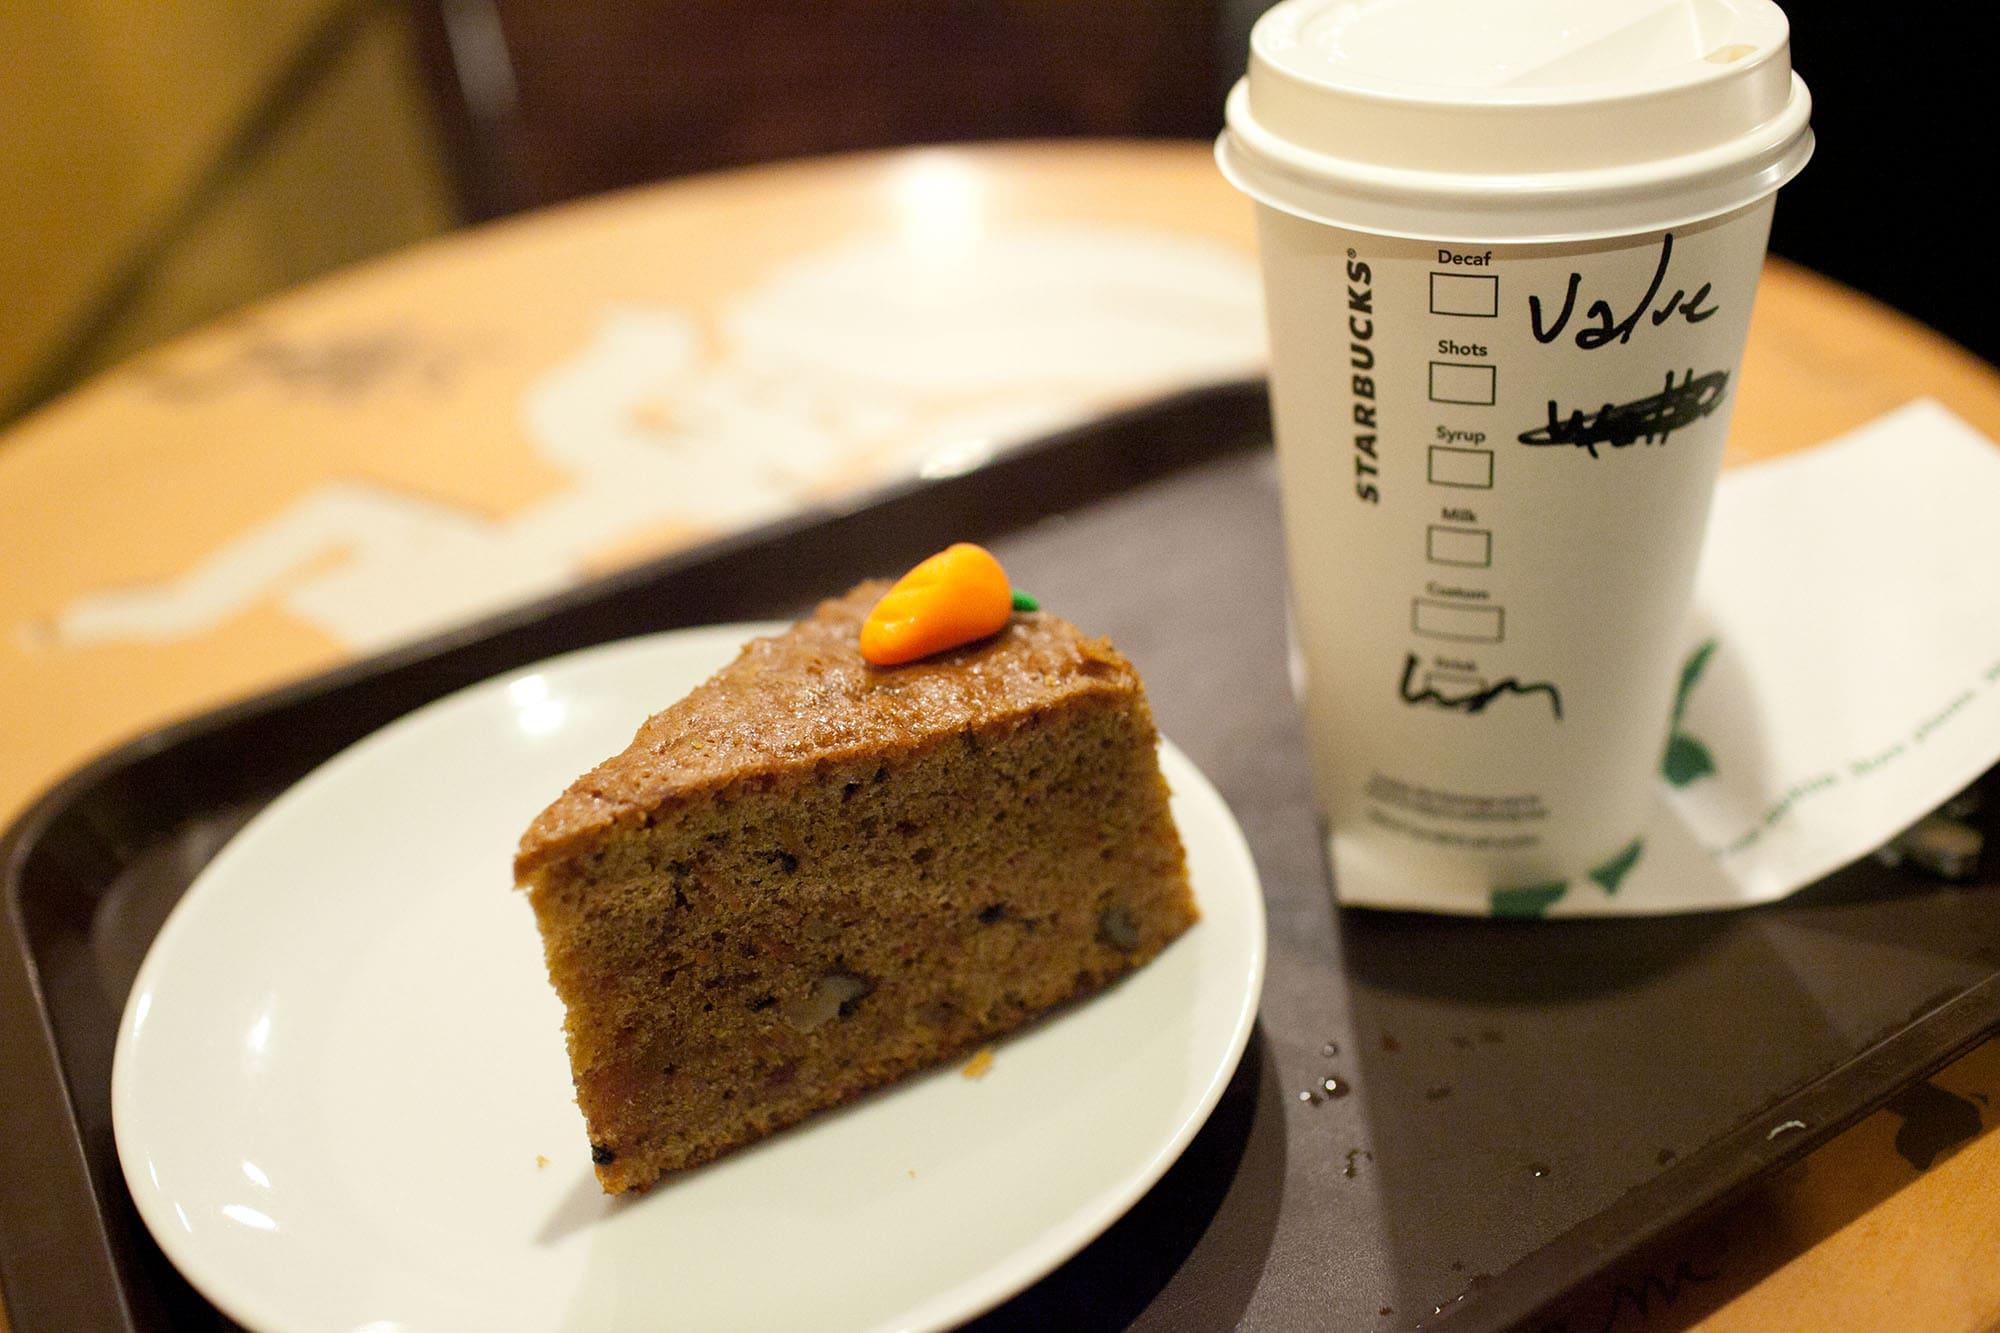 Carrot cake at Starbucks in Istanbul, Turkey